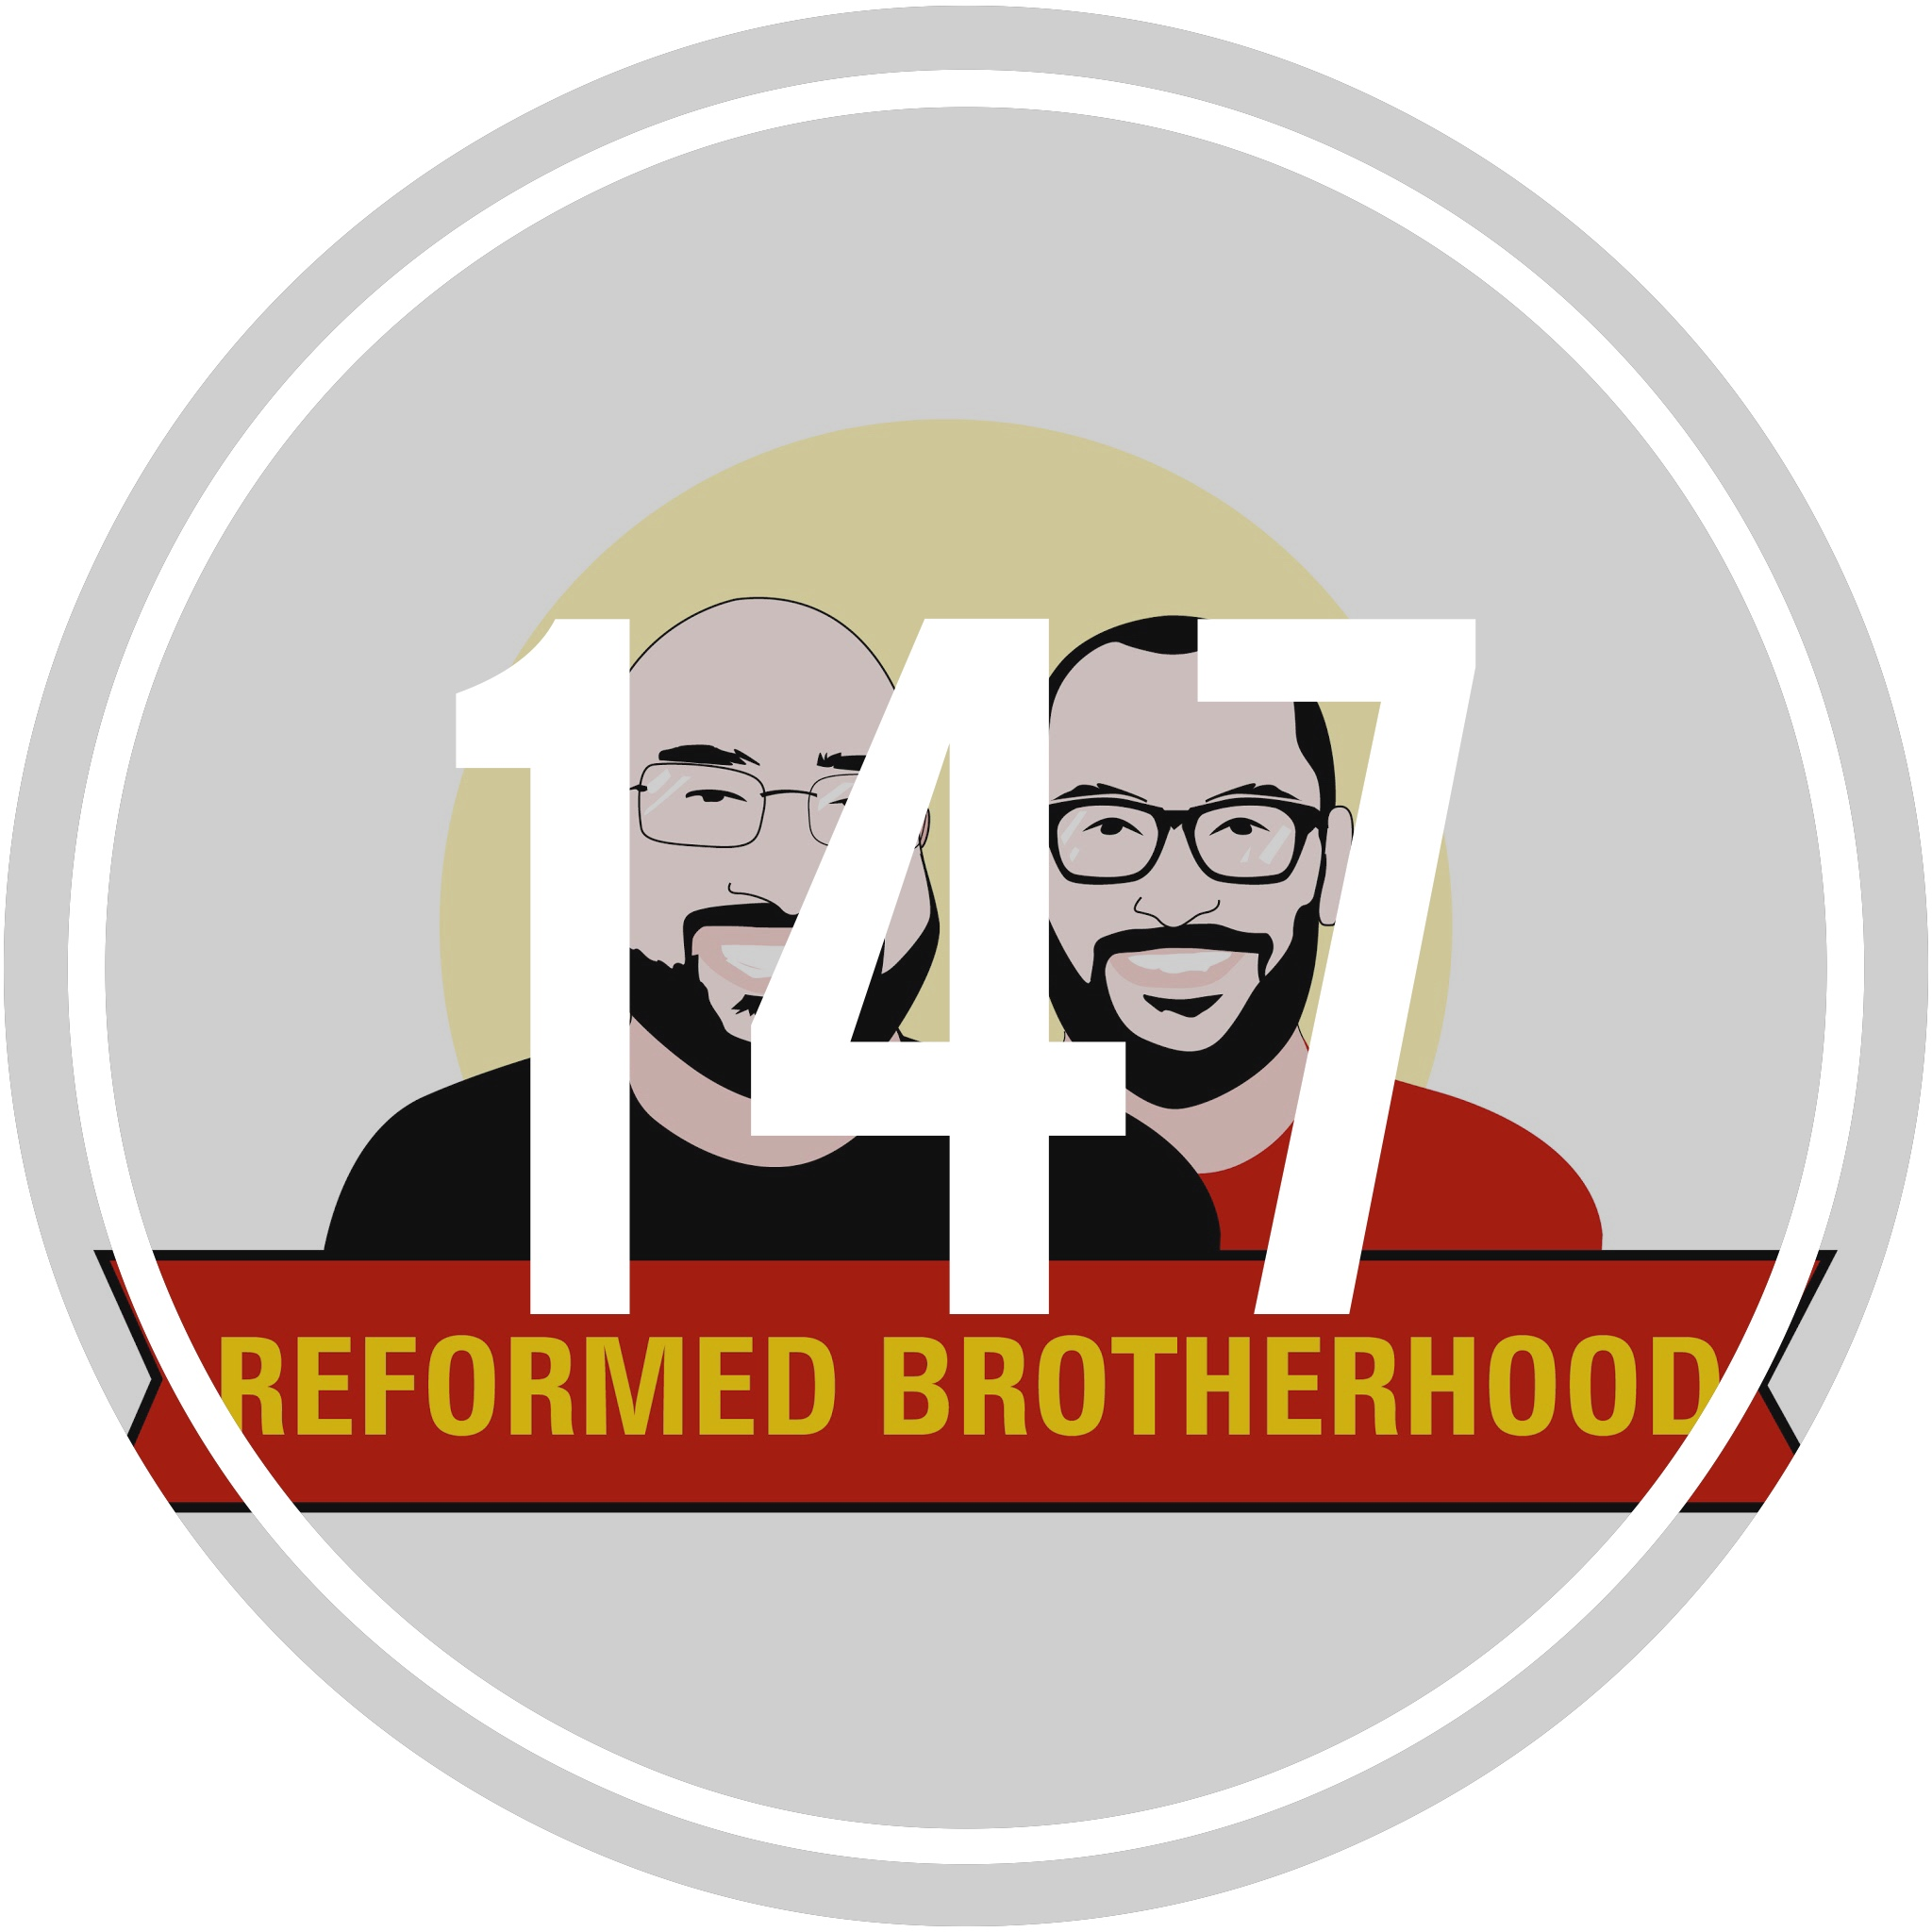 Reformed Brotherhood – Honor Everyone  Love the Brotherhood